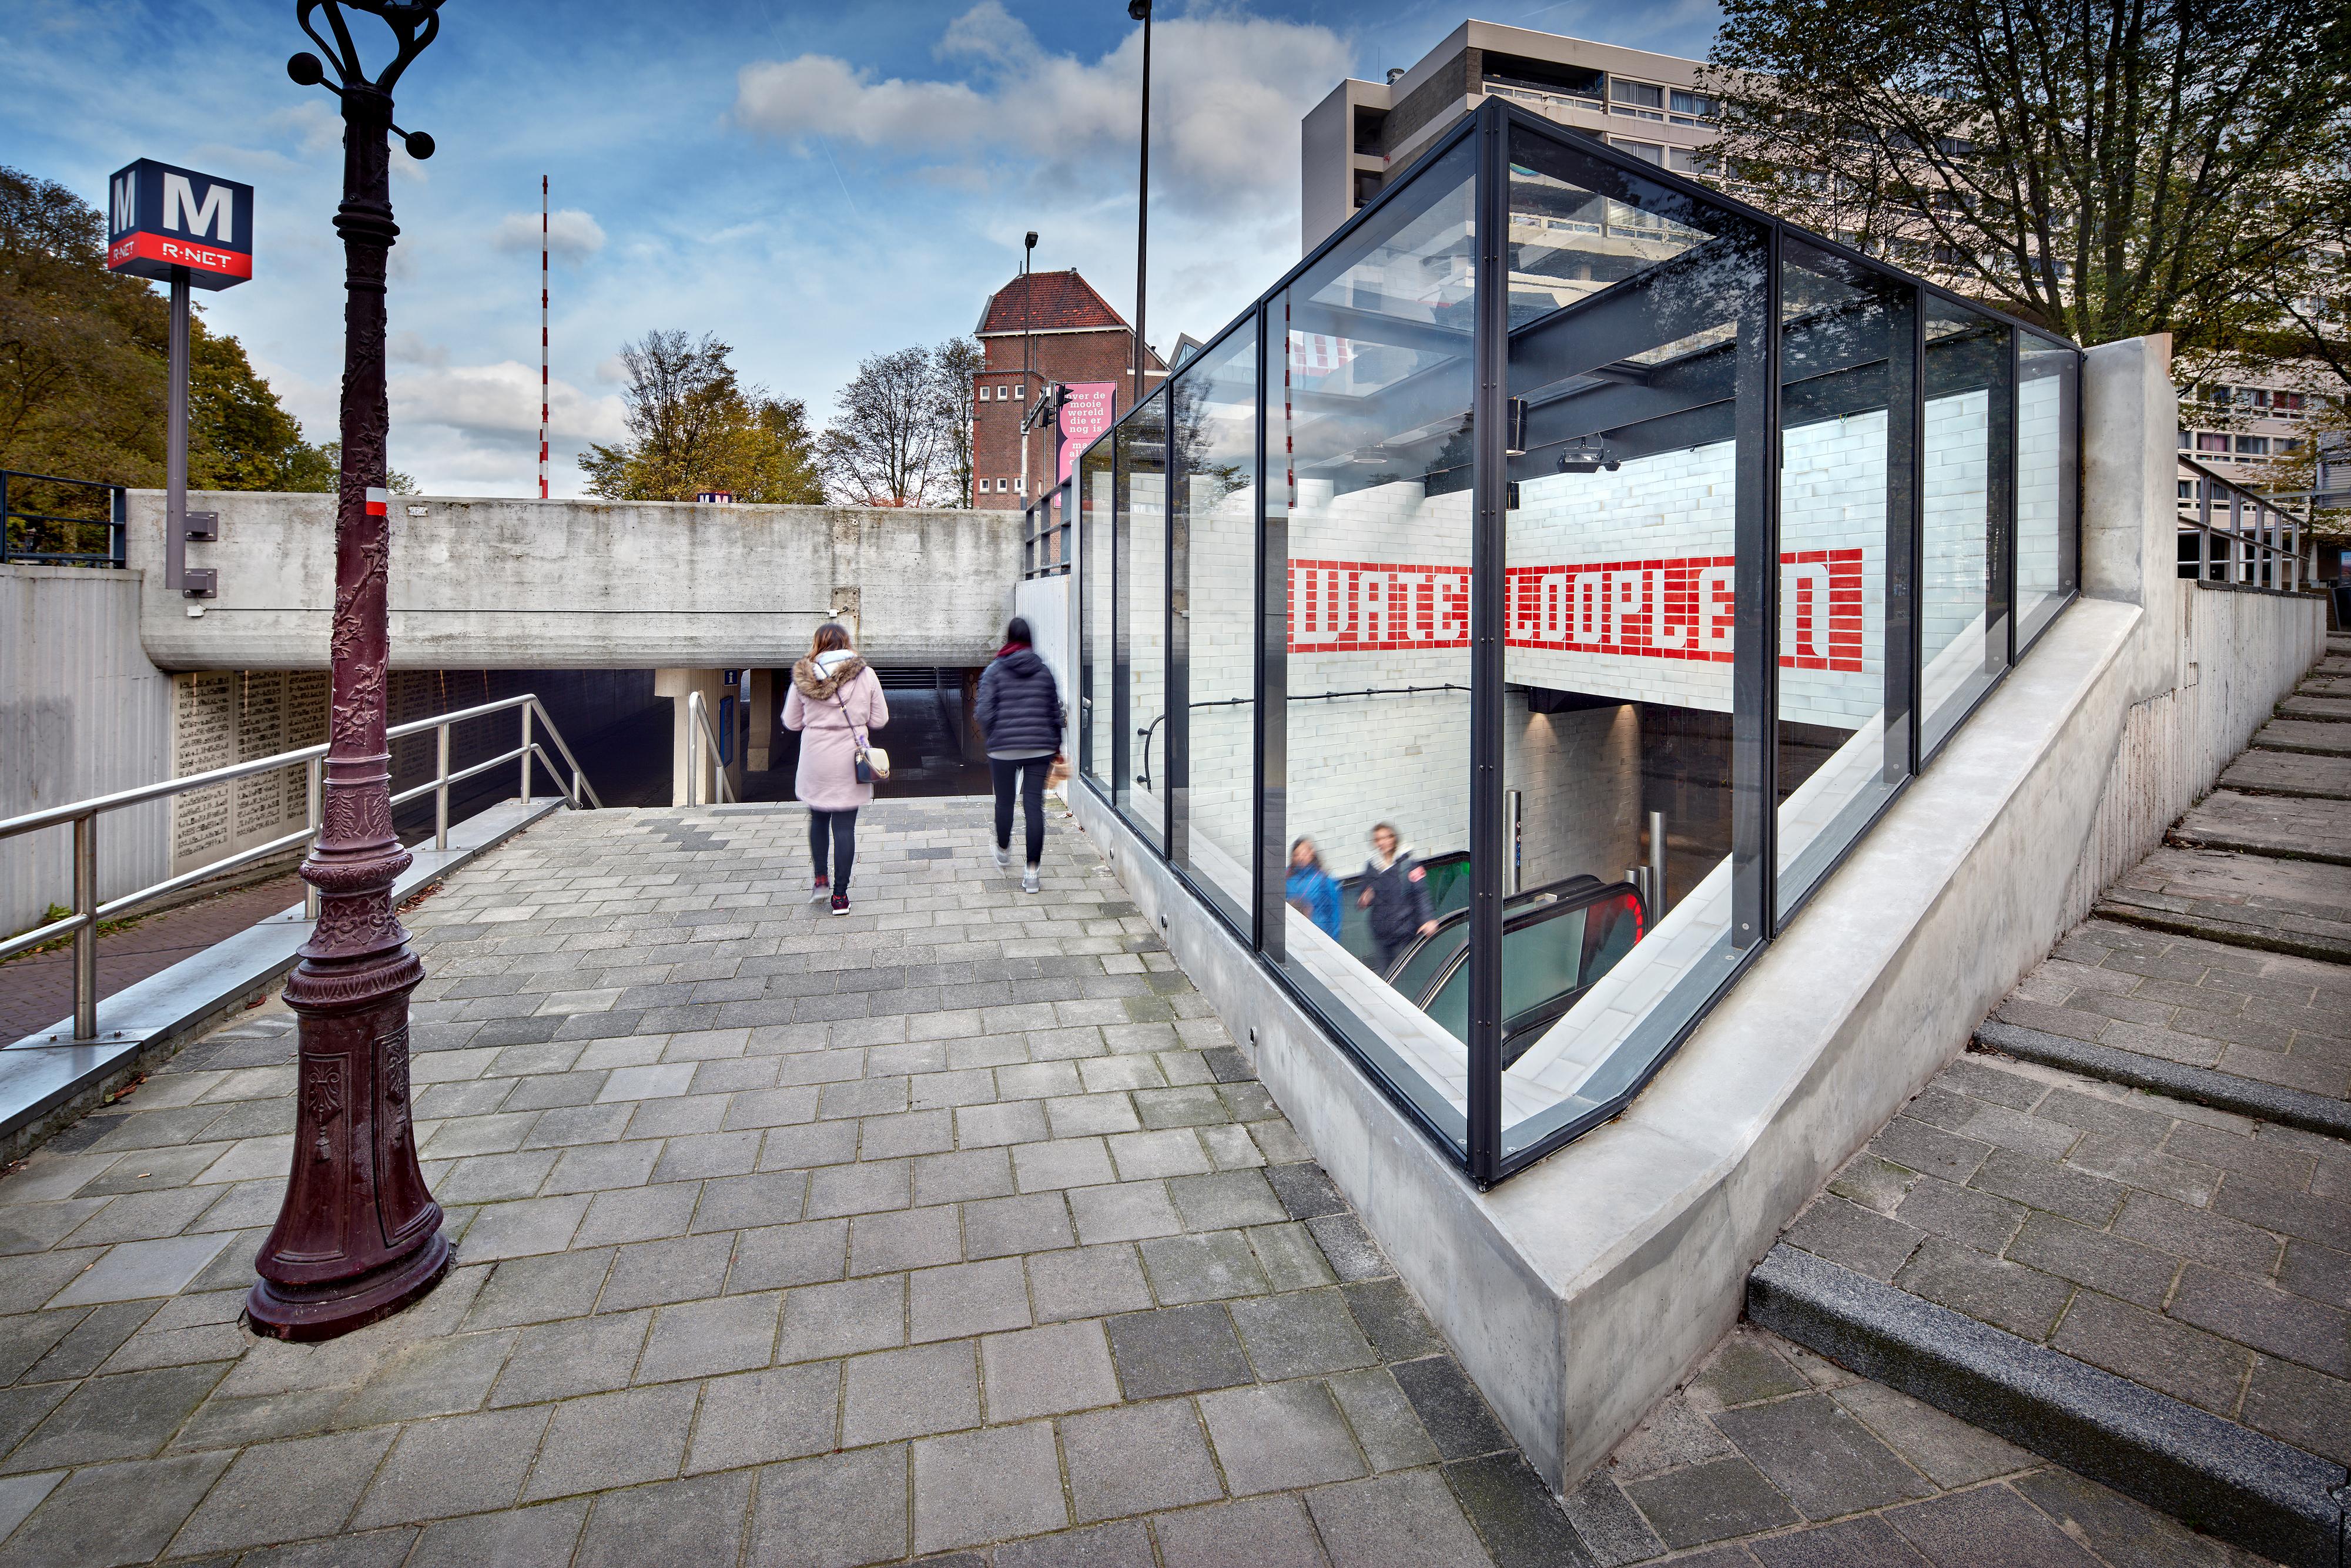 <p>Group A; Metrostation Waterlooplein</p>